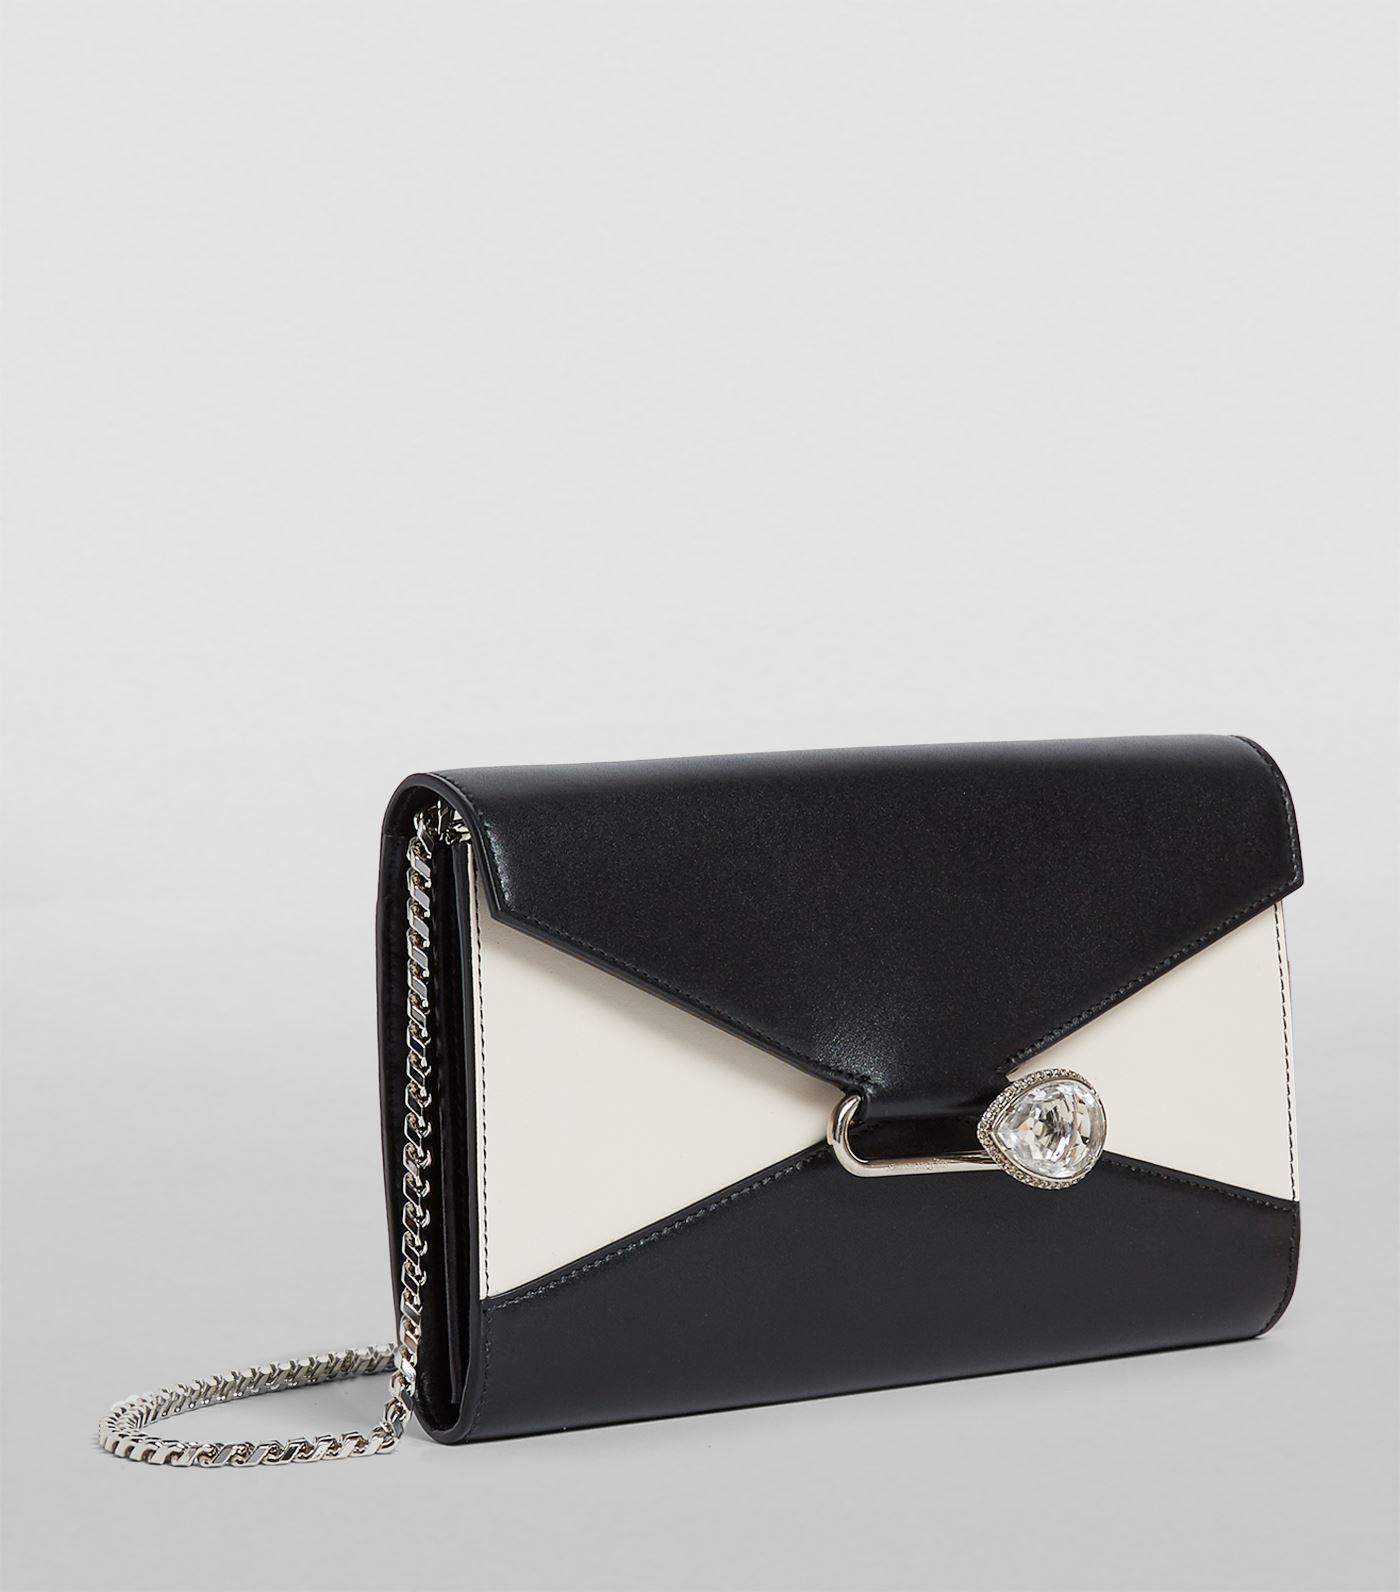 b0330b8fa638 Alexander McQueen Leather Pin Wallet Bag #AD , #Ad, #Leather, #McQueen, # Alexander, #Bag, #Wallet